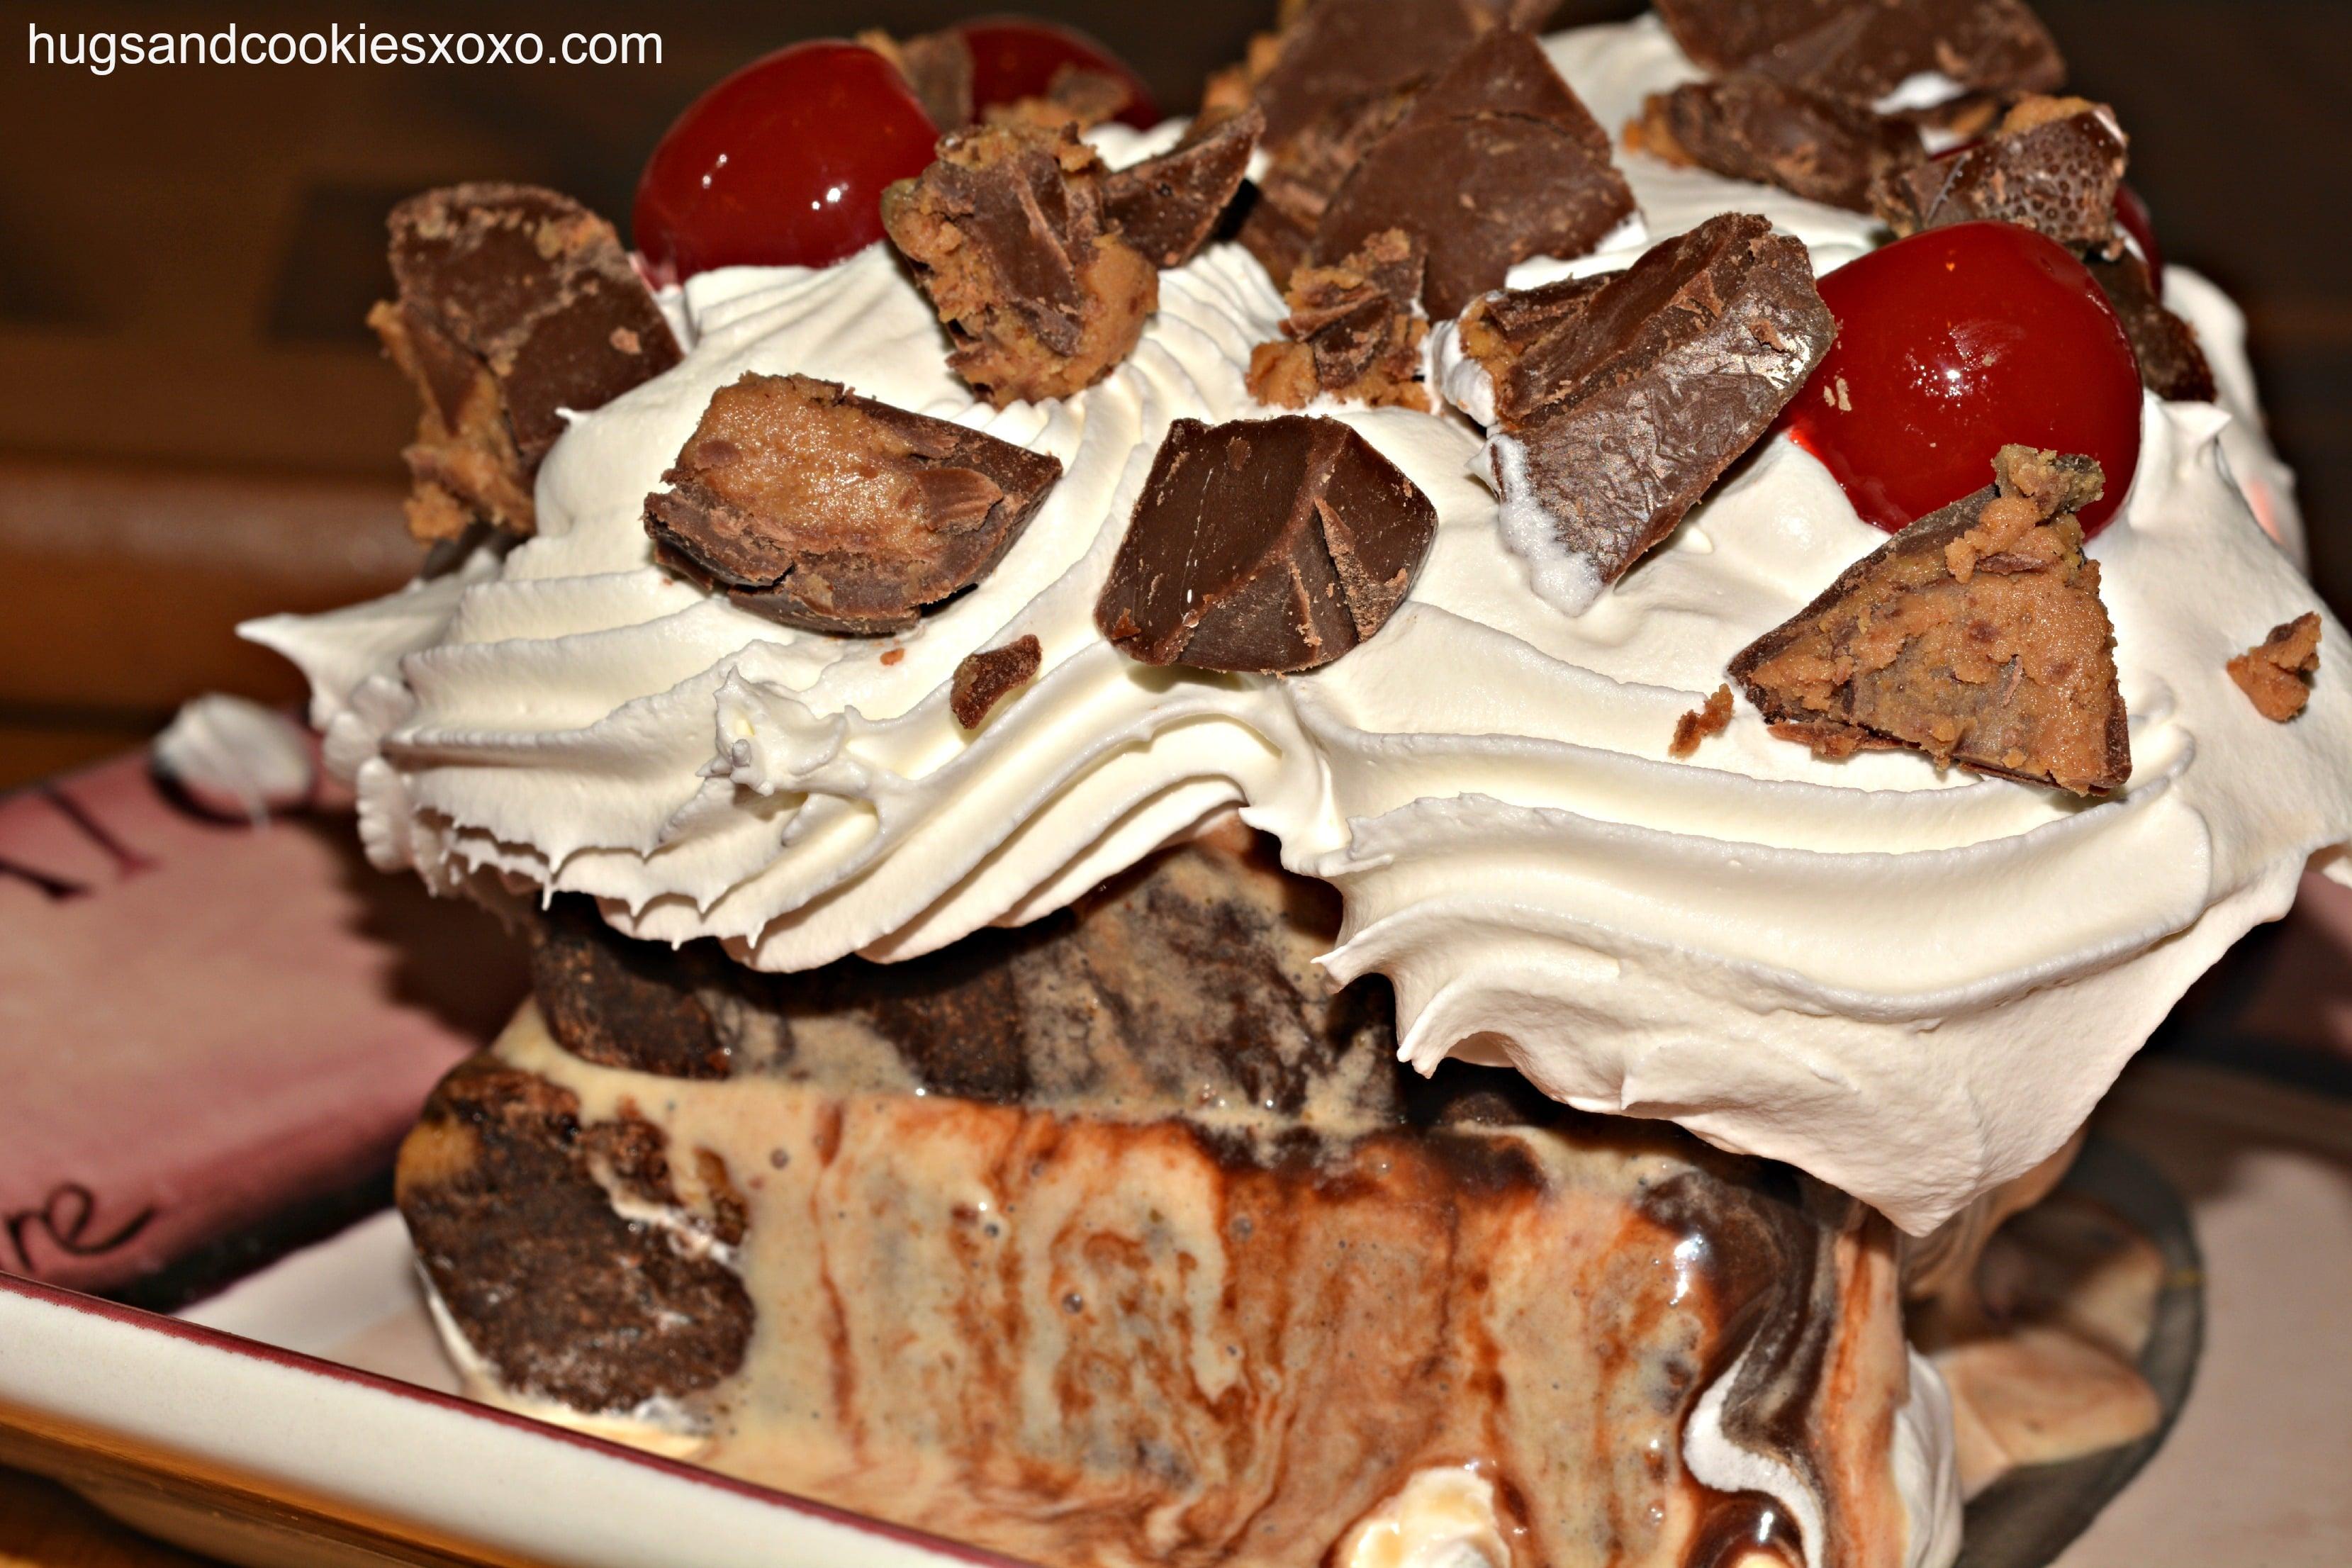 Peanut Butter Brownie Ice Cream Cake - Hugs and Cookies XOXO